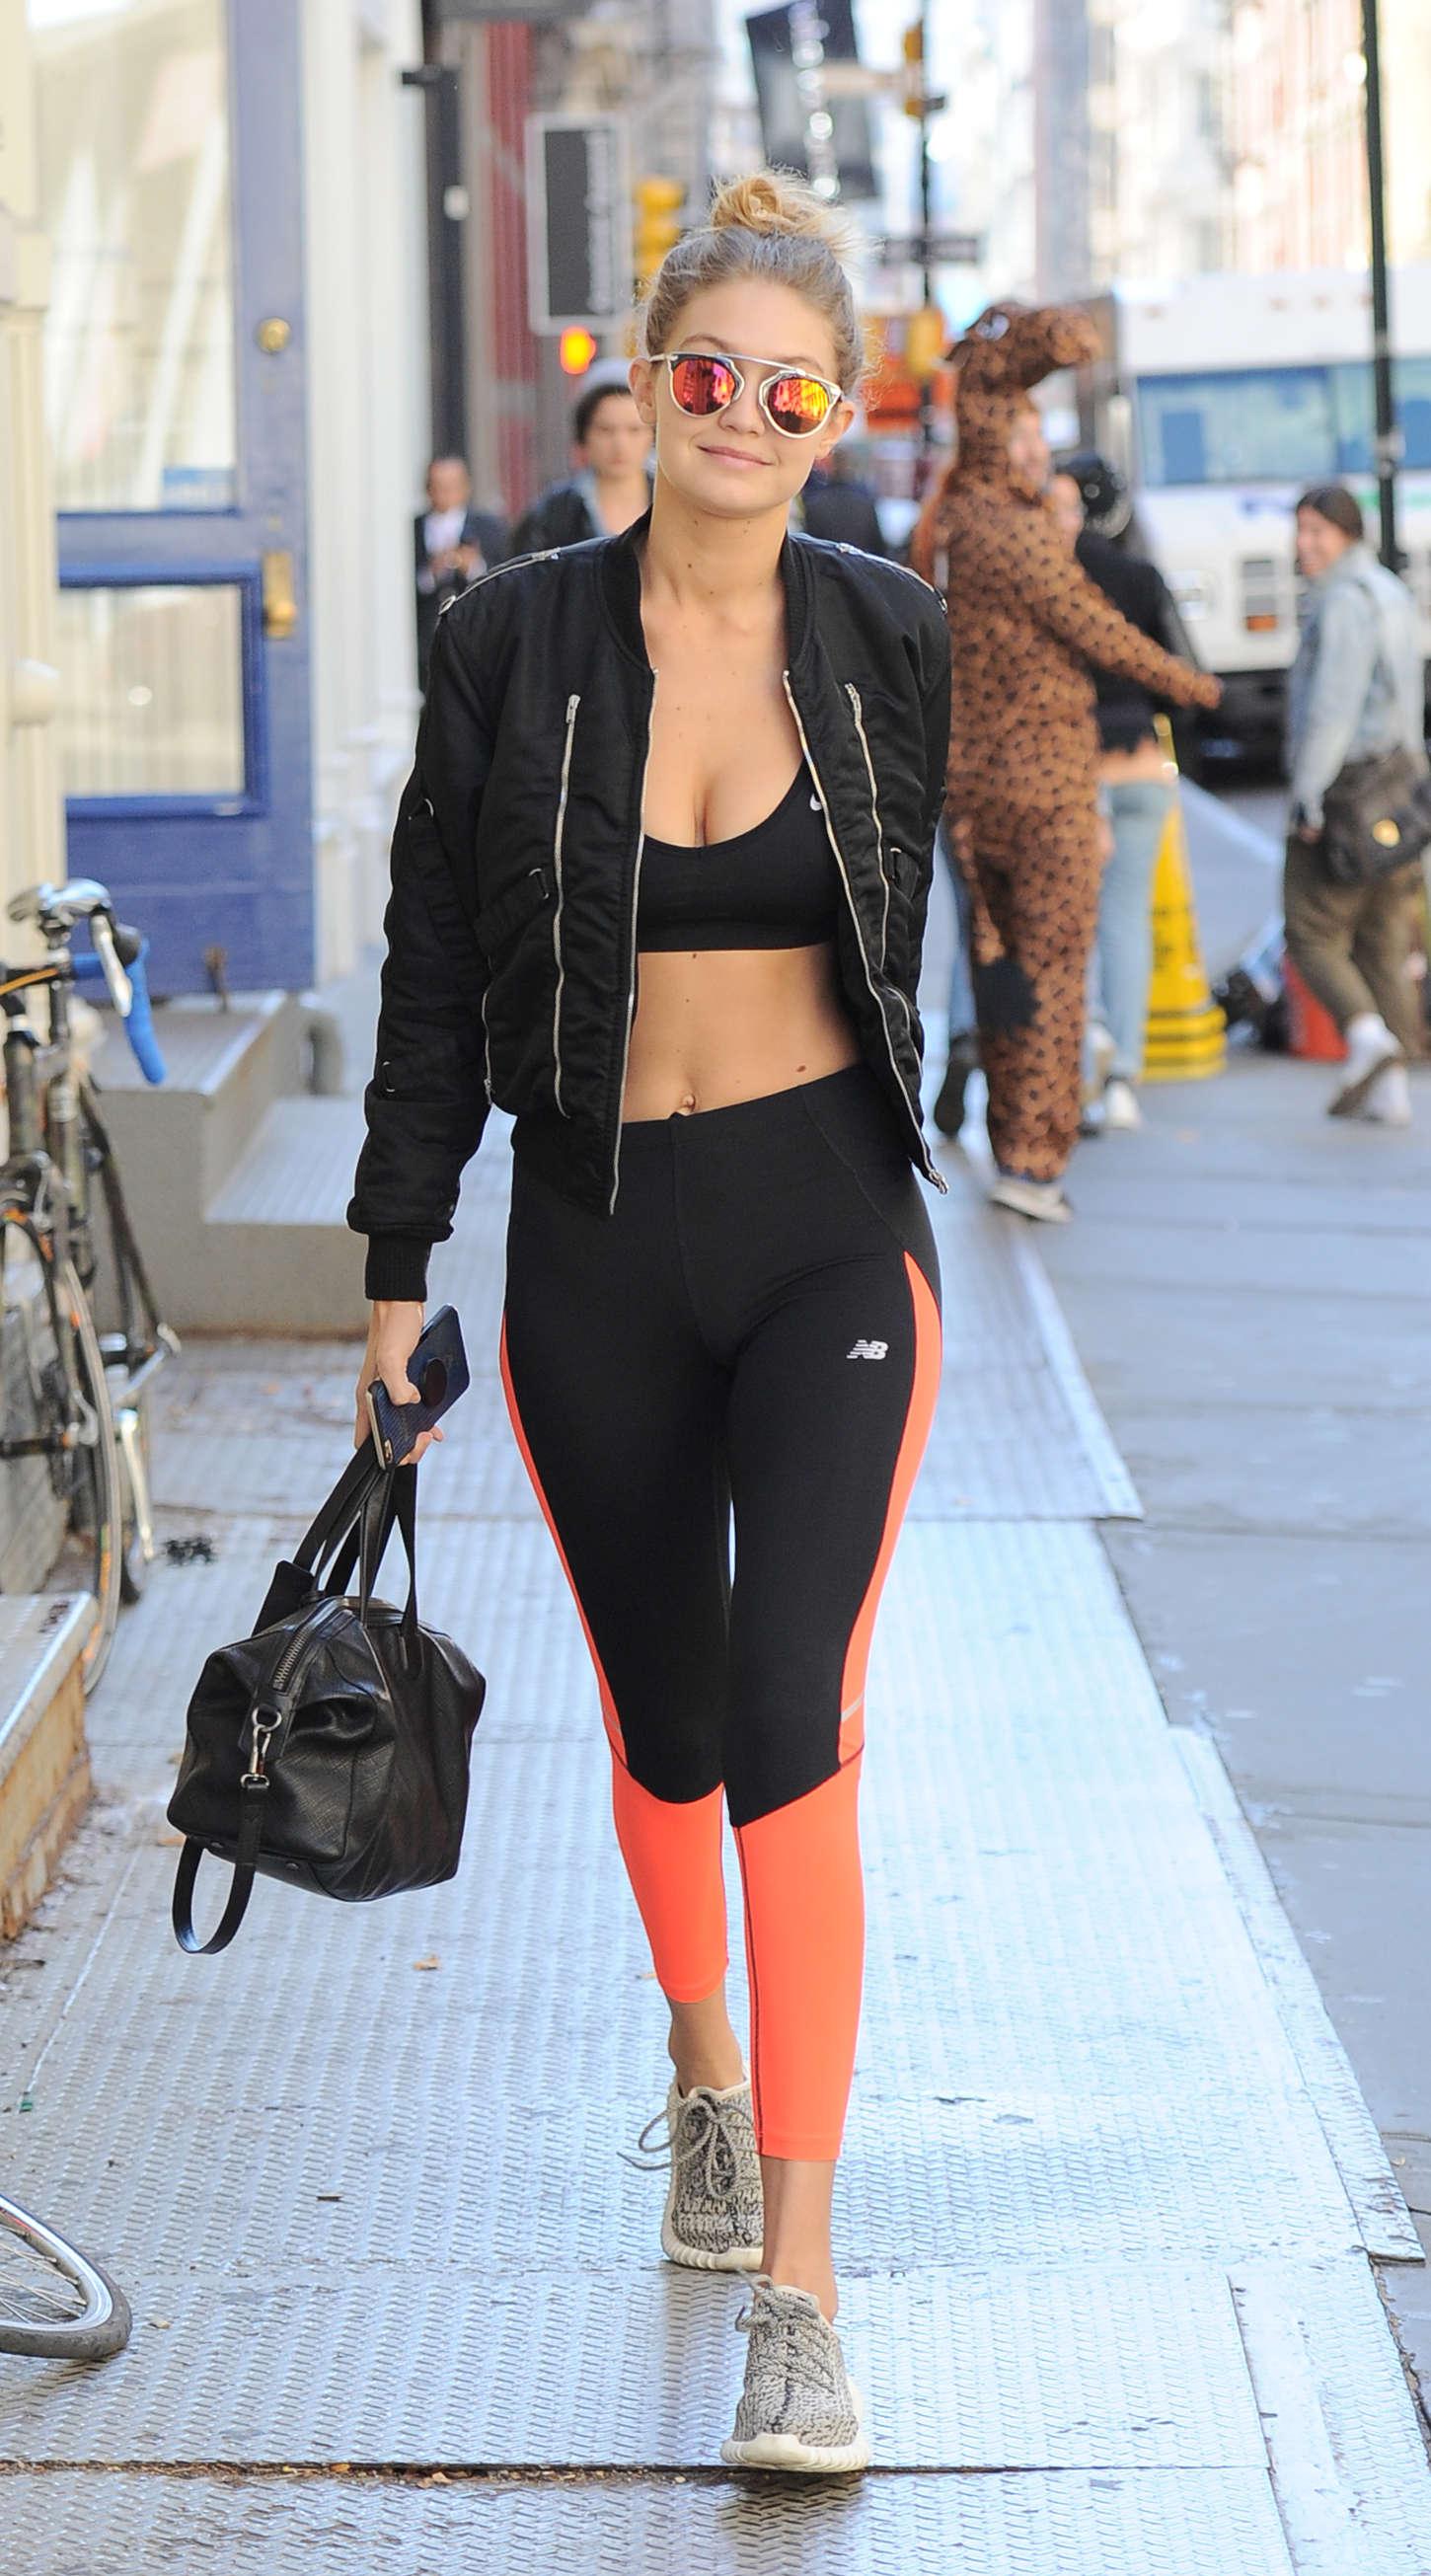 Gigi Hadid in Sports Bra and Tights -13